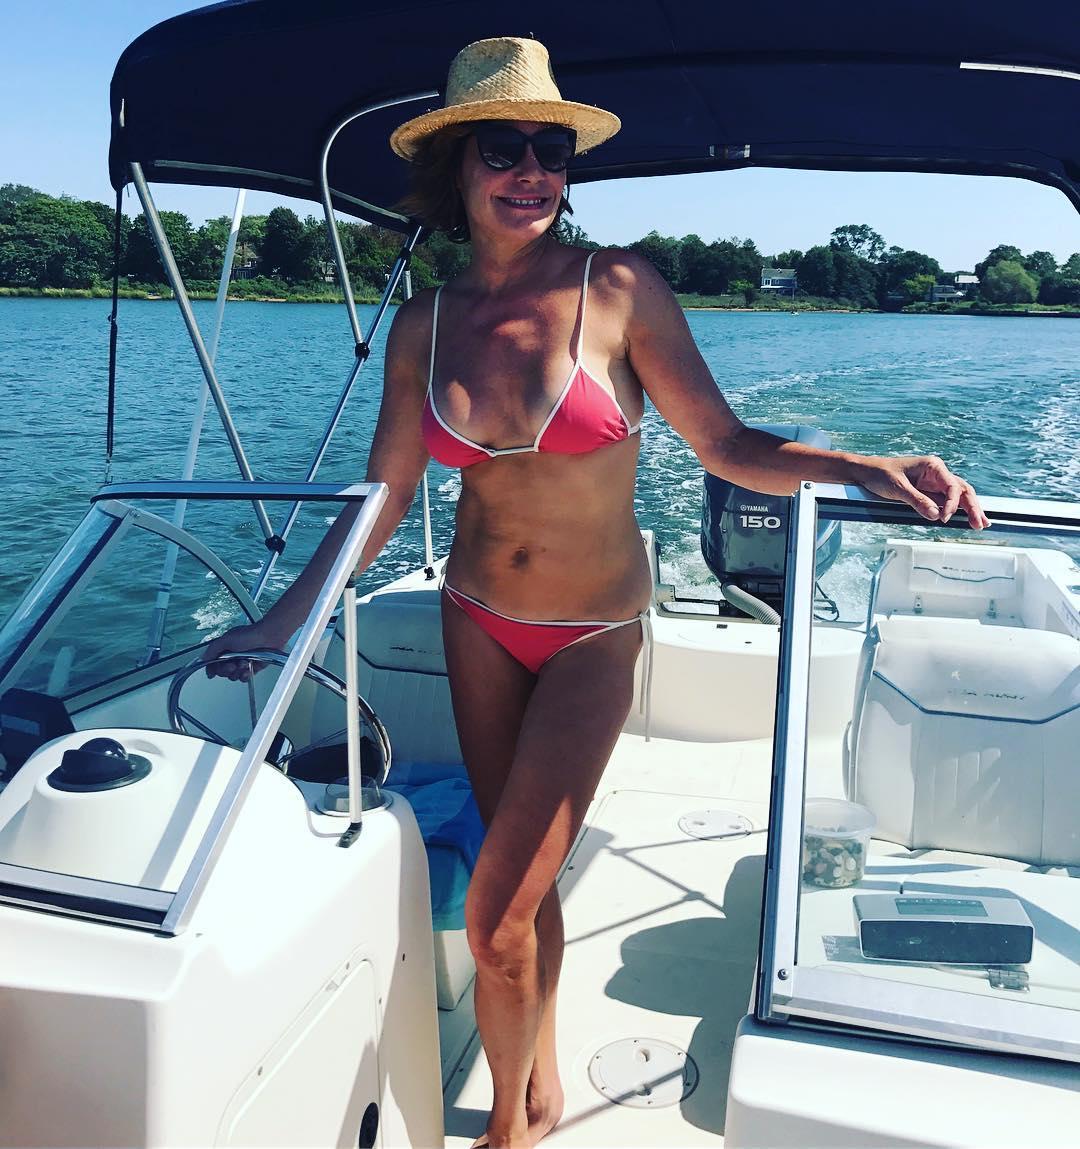 Bikini Luann de Lesseps nudes (98 pics), Hot